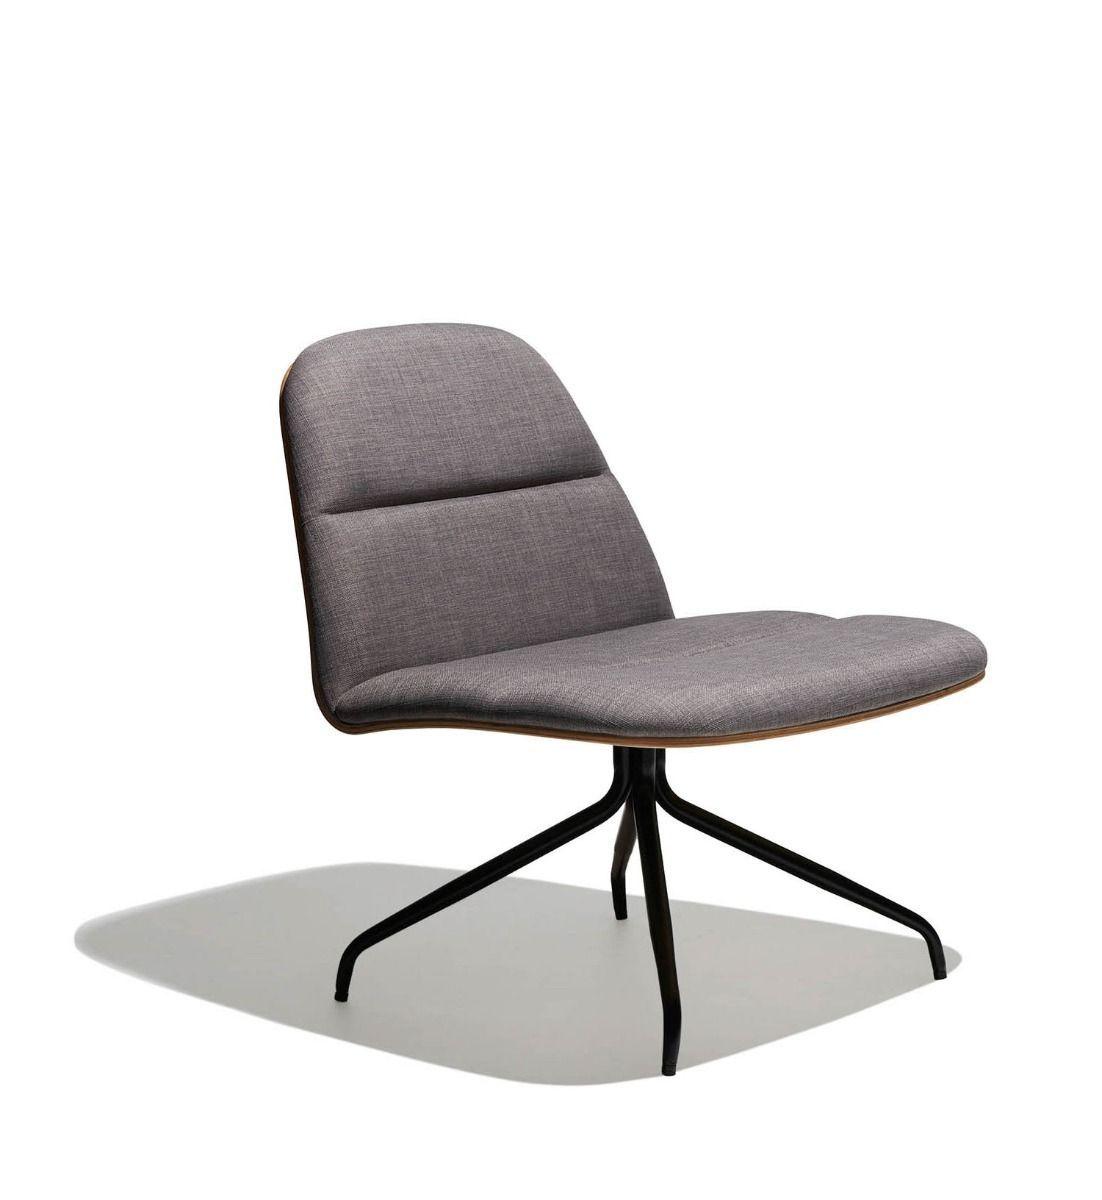 bloom lounge chair - chairs - shop | chair design | pinterest